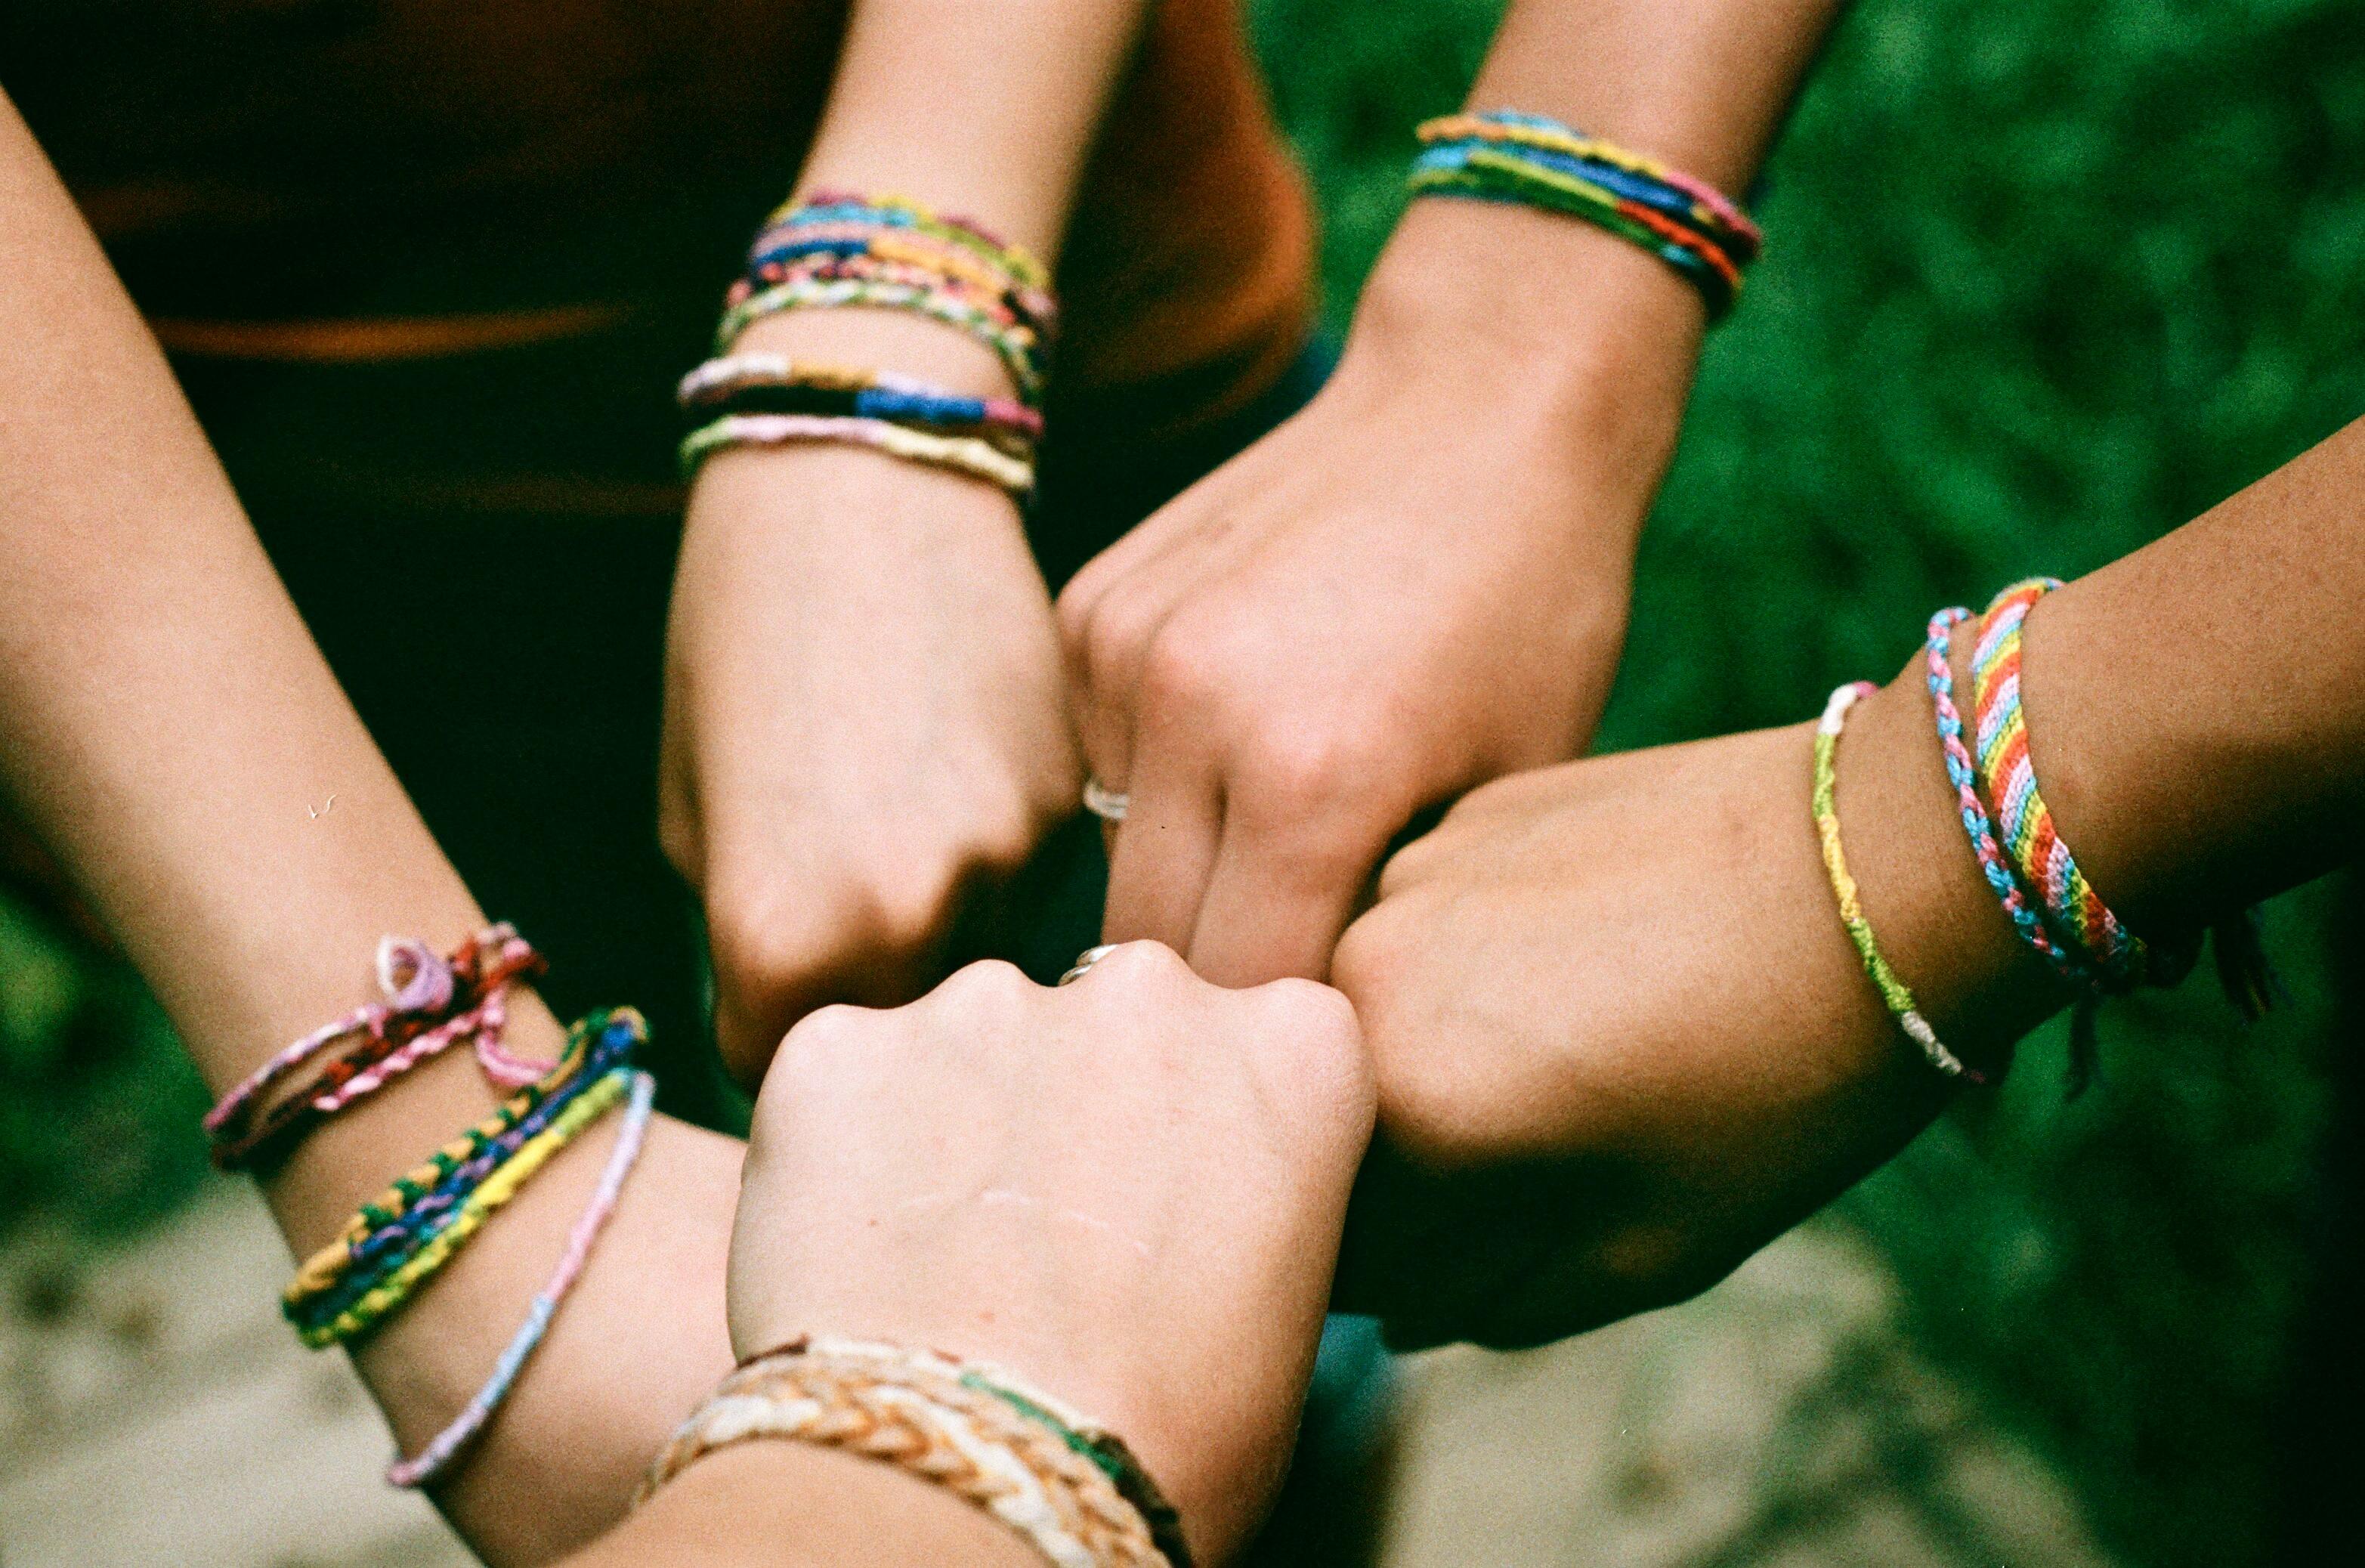 Wallpaper : bracelets, friendship, turquoise, holding hands, camp ...